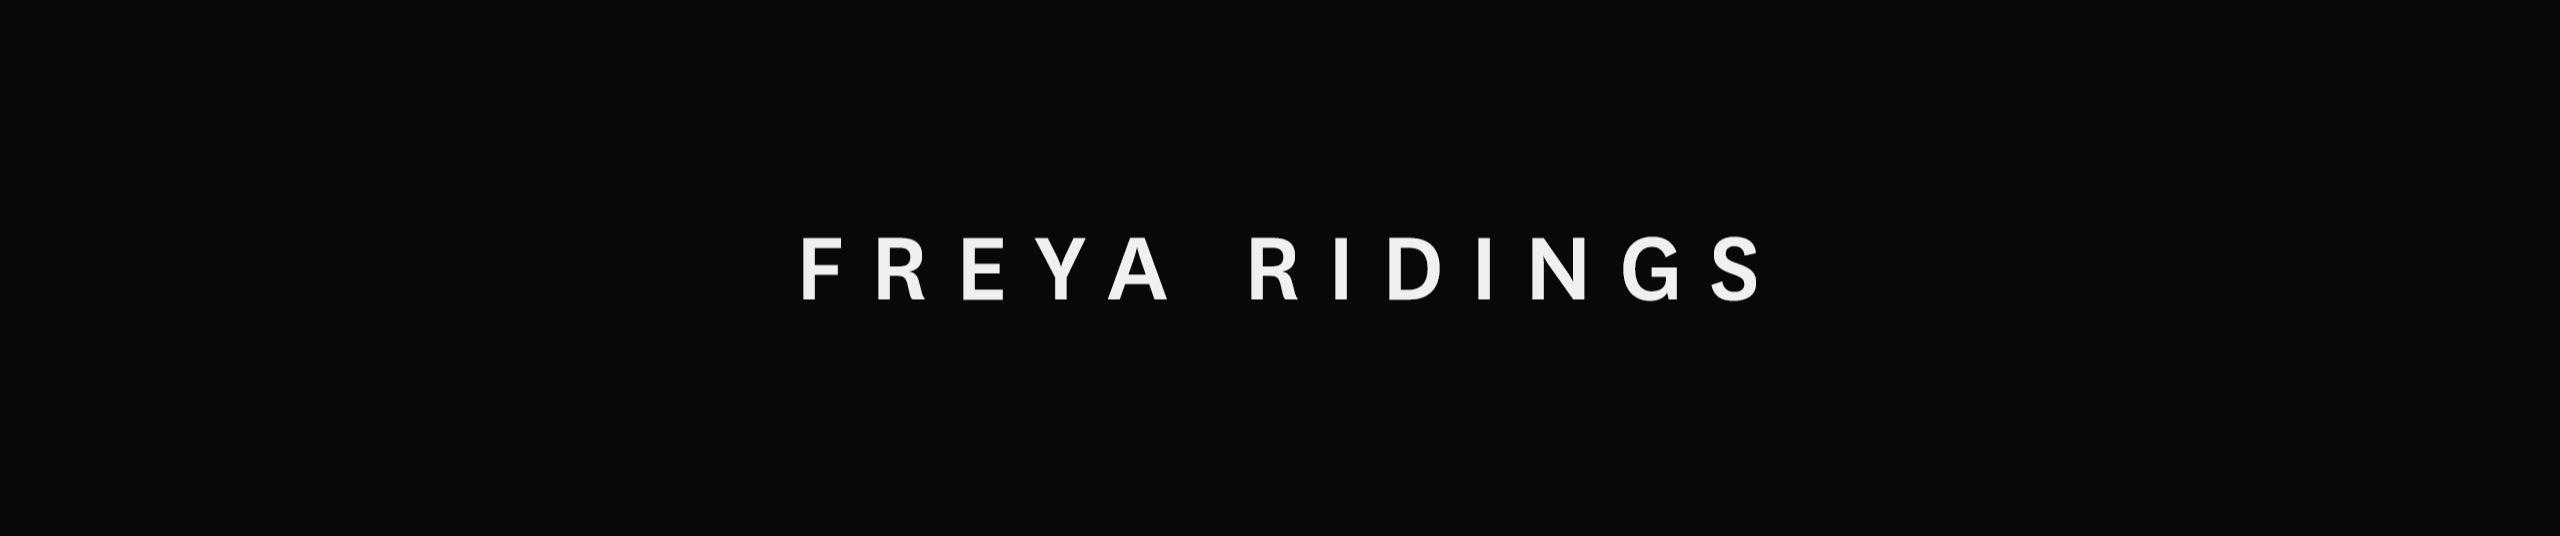 Bildergebnis für Freya Ridings Logo